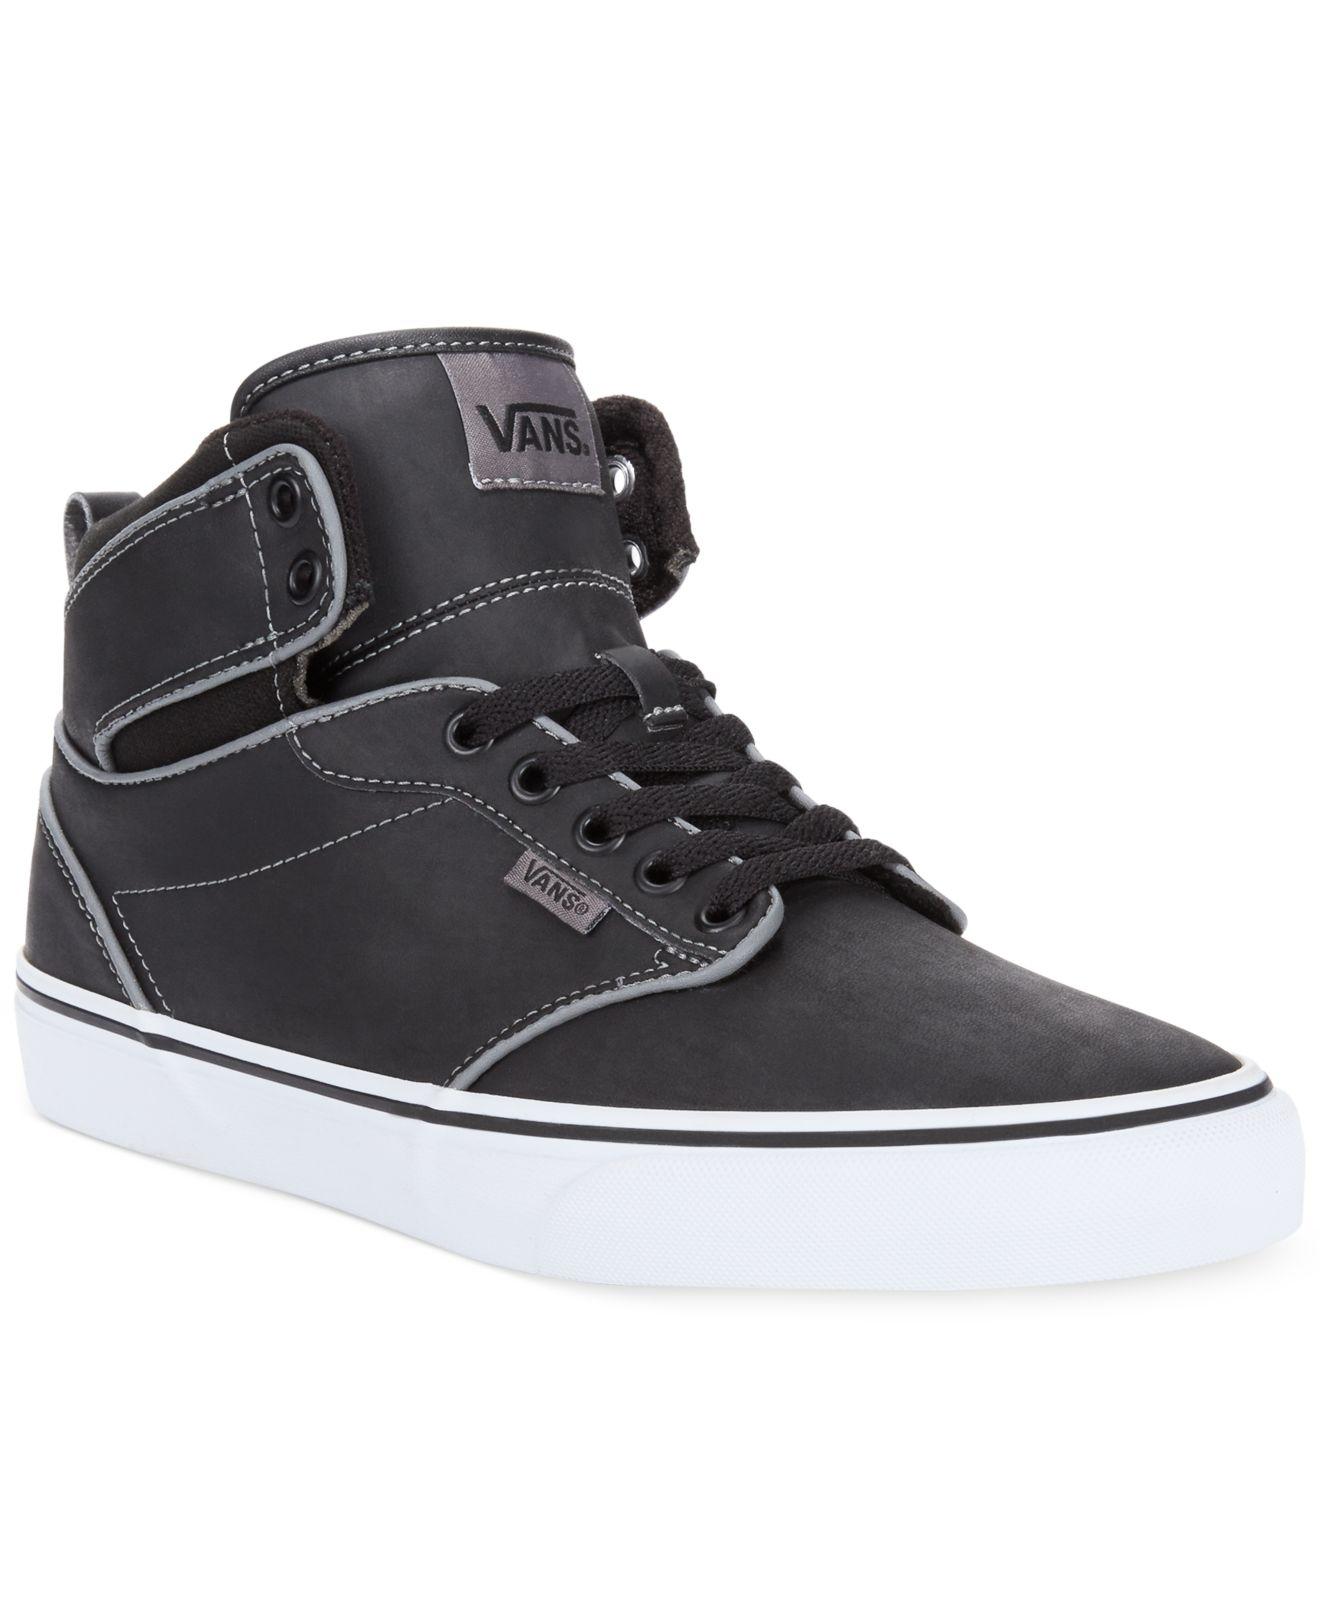 631827588558 Lyst - Vans Atwood Hi-Top Sneakers in Black for Men